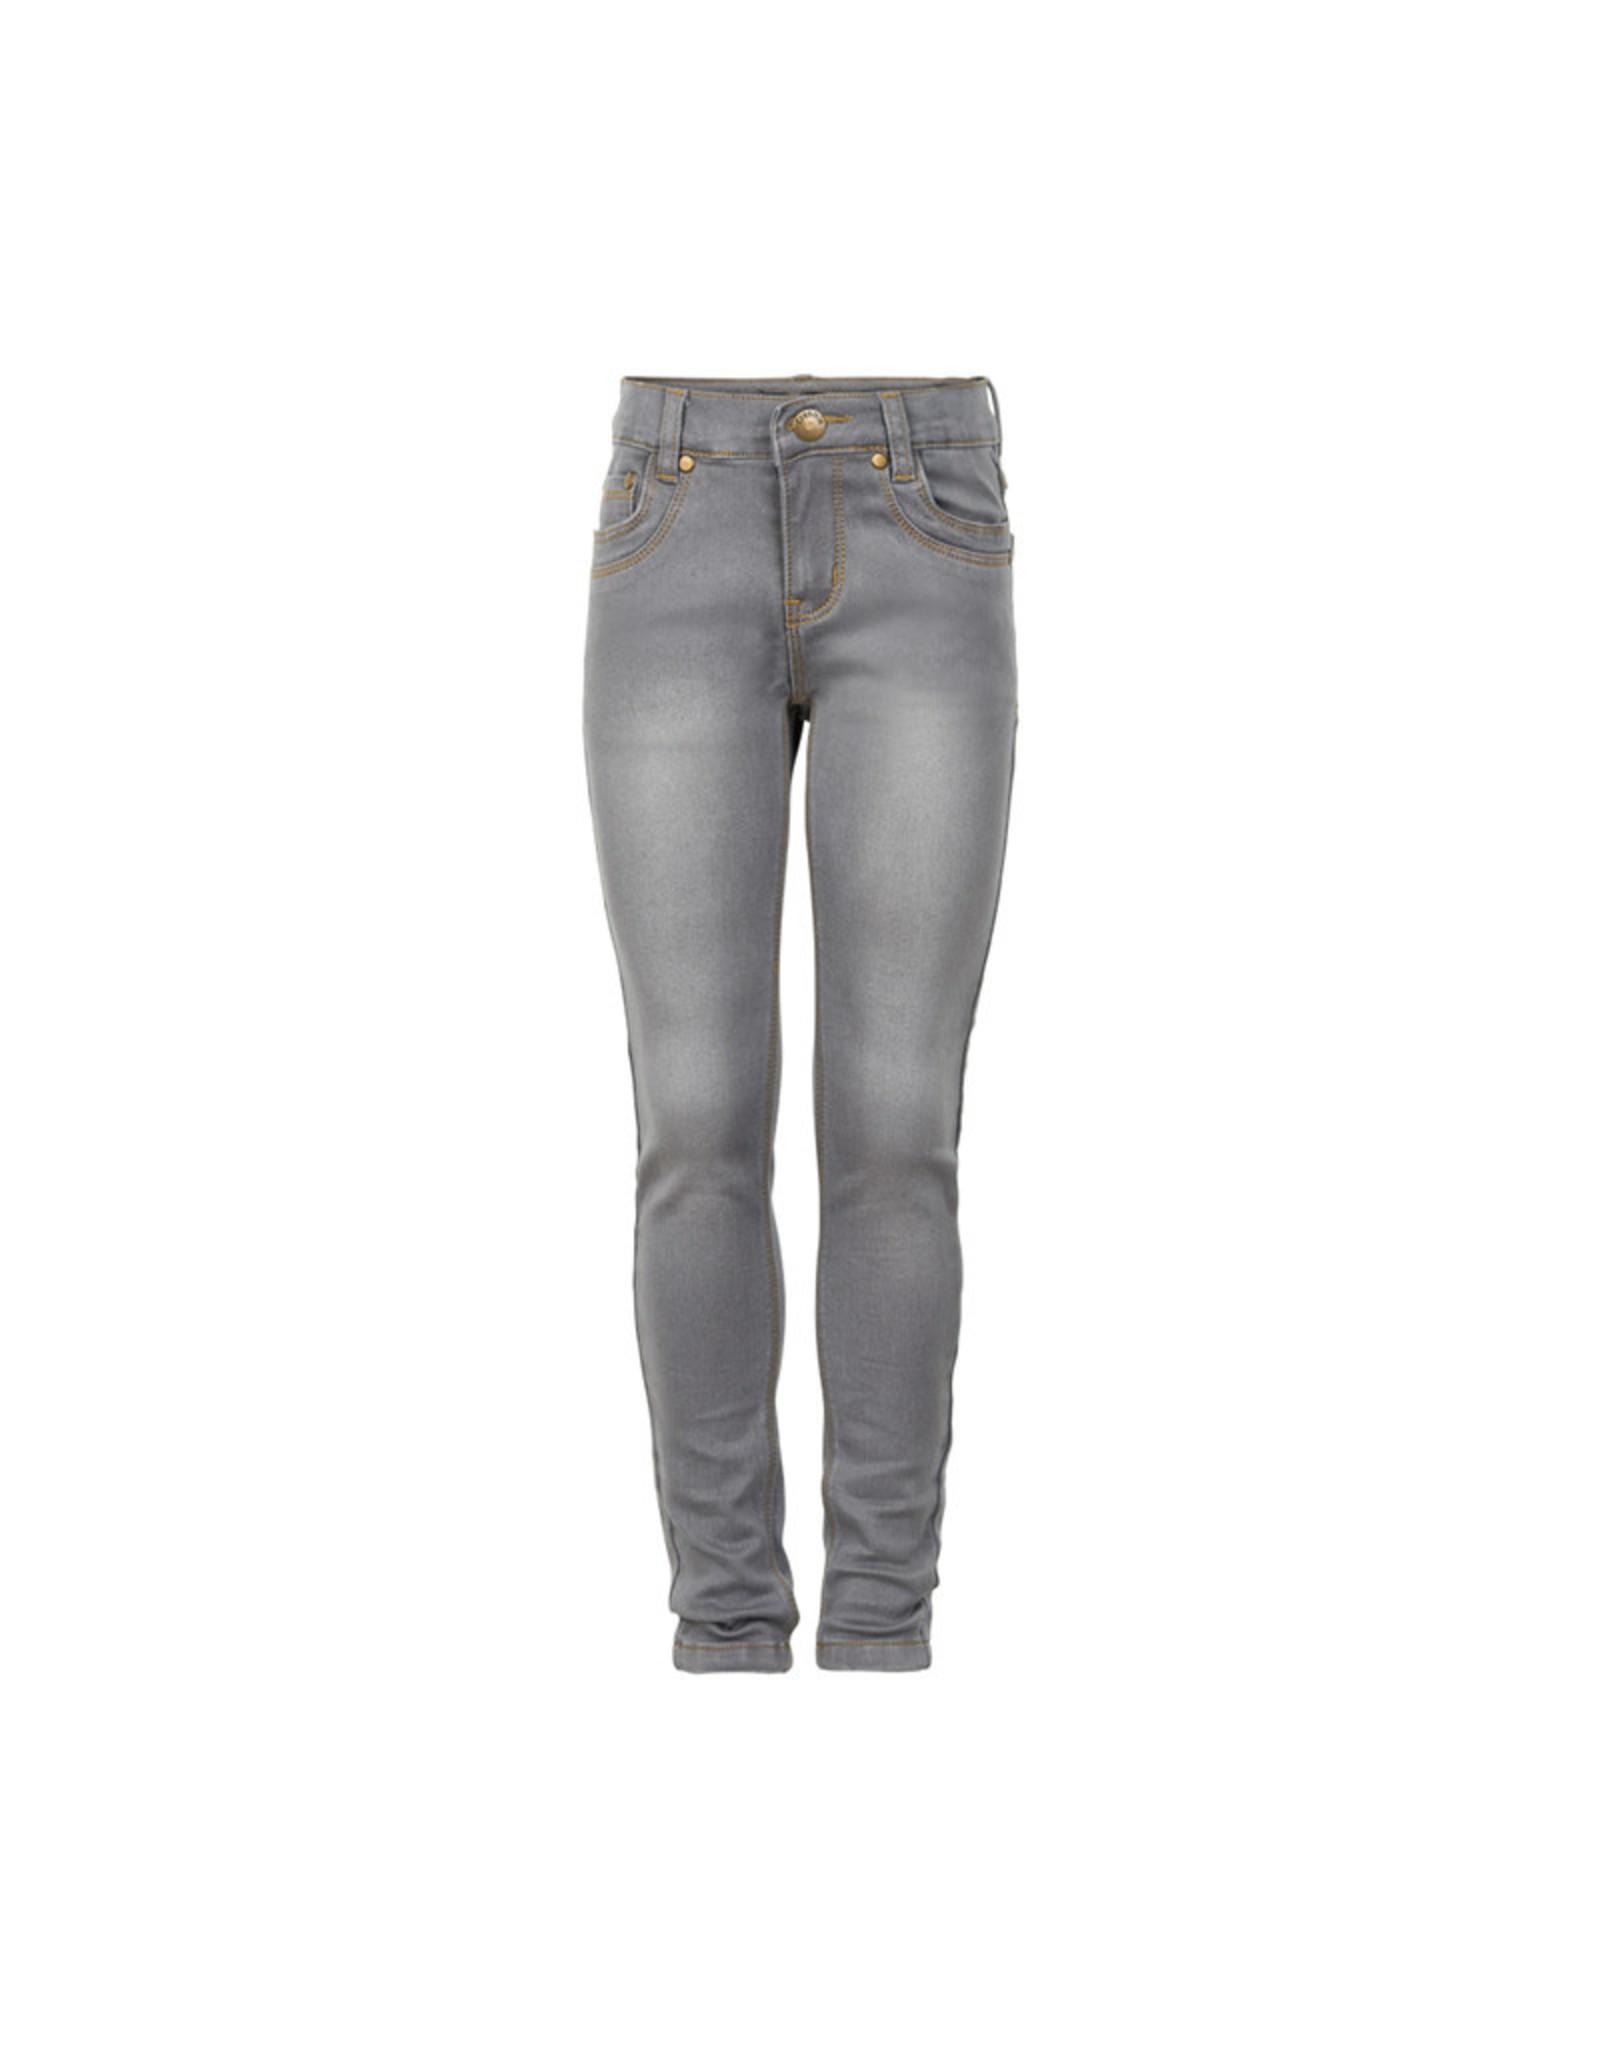 Creamie Creamie Jeans- Grey Denim